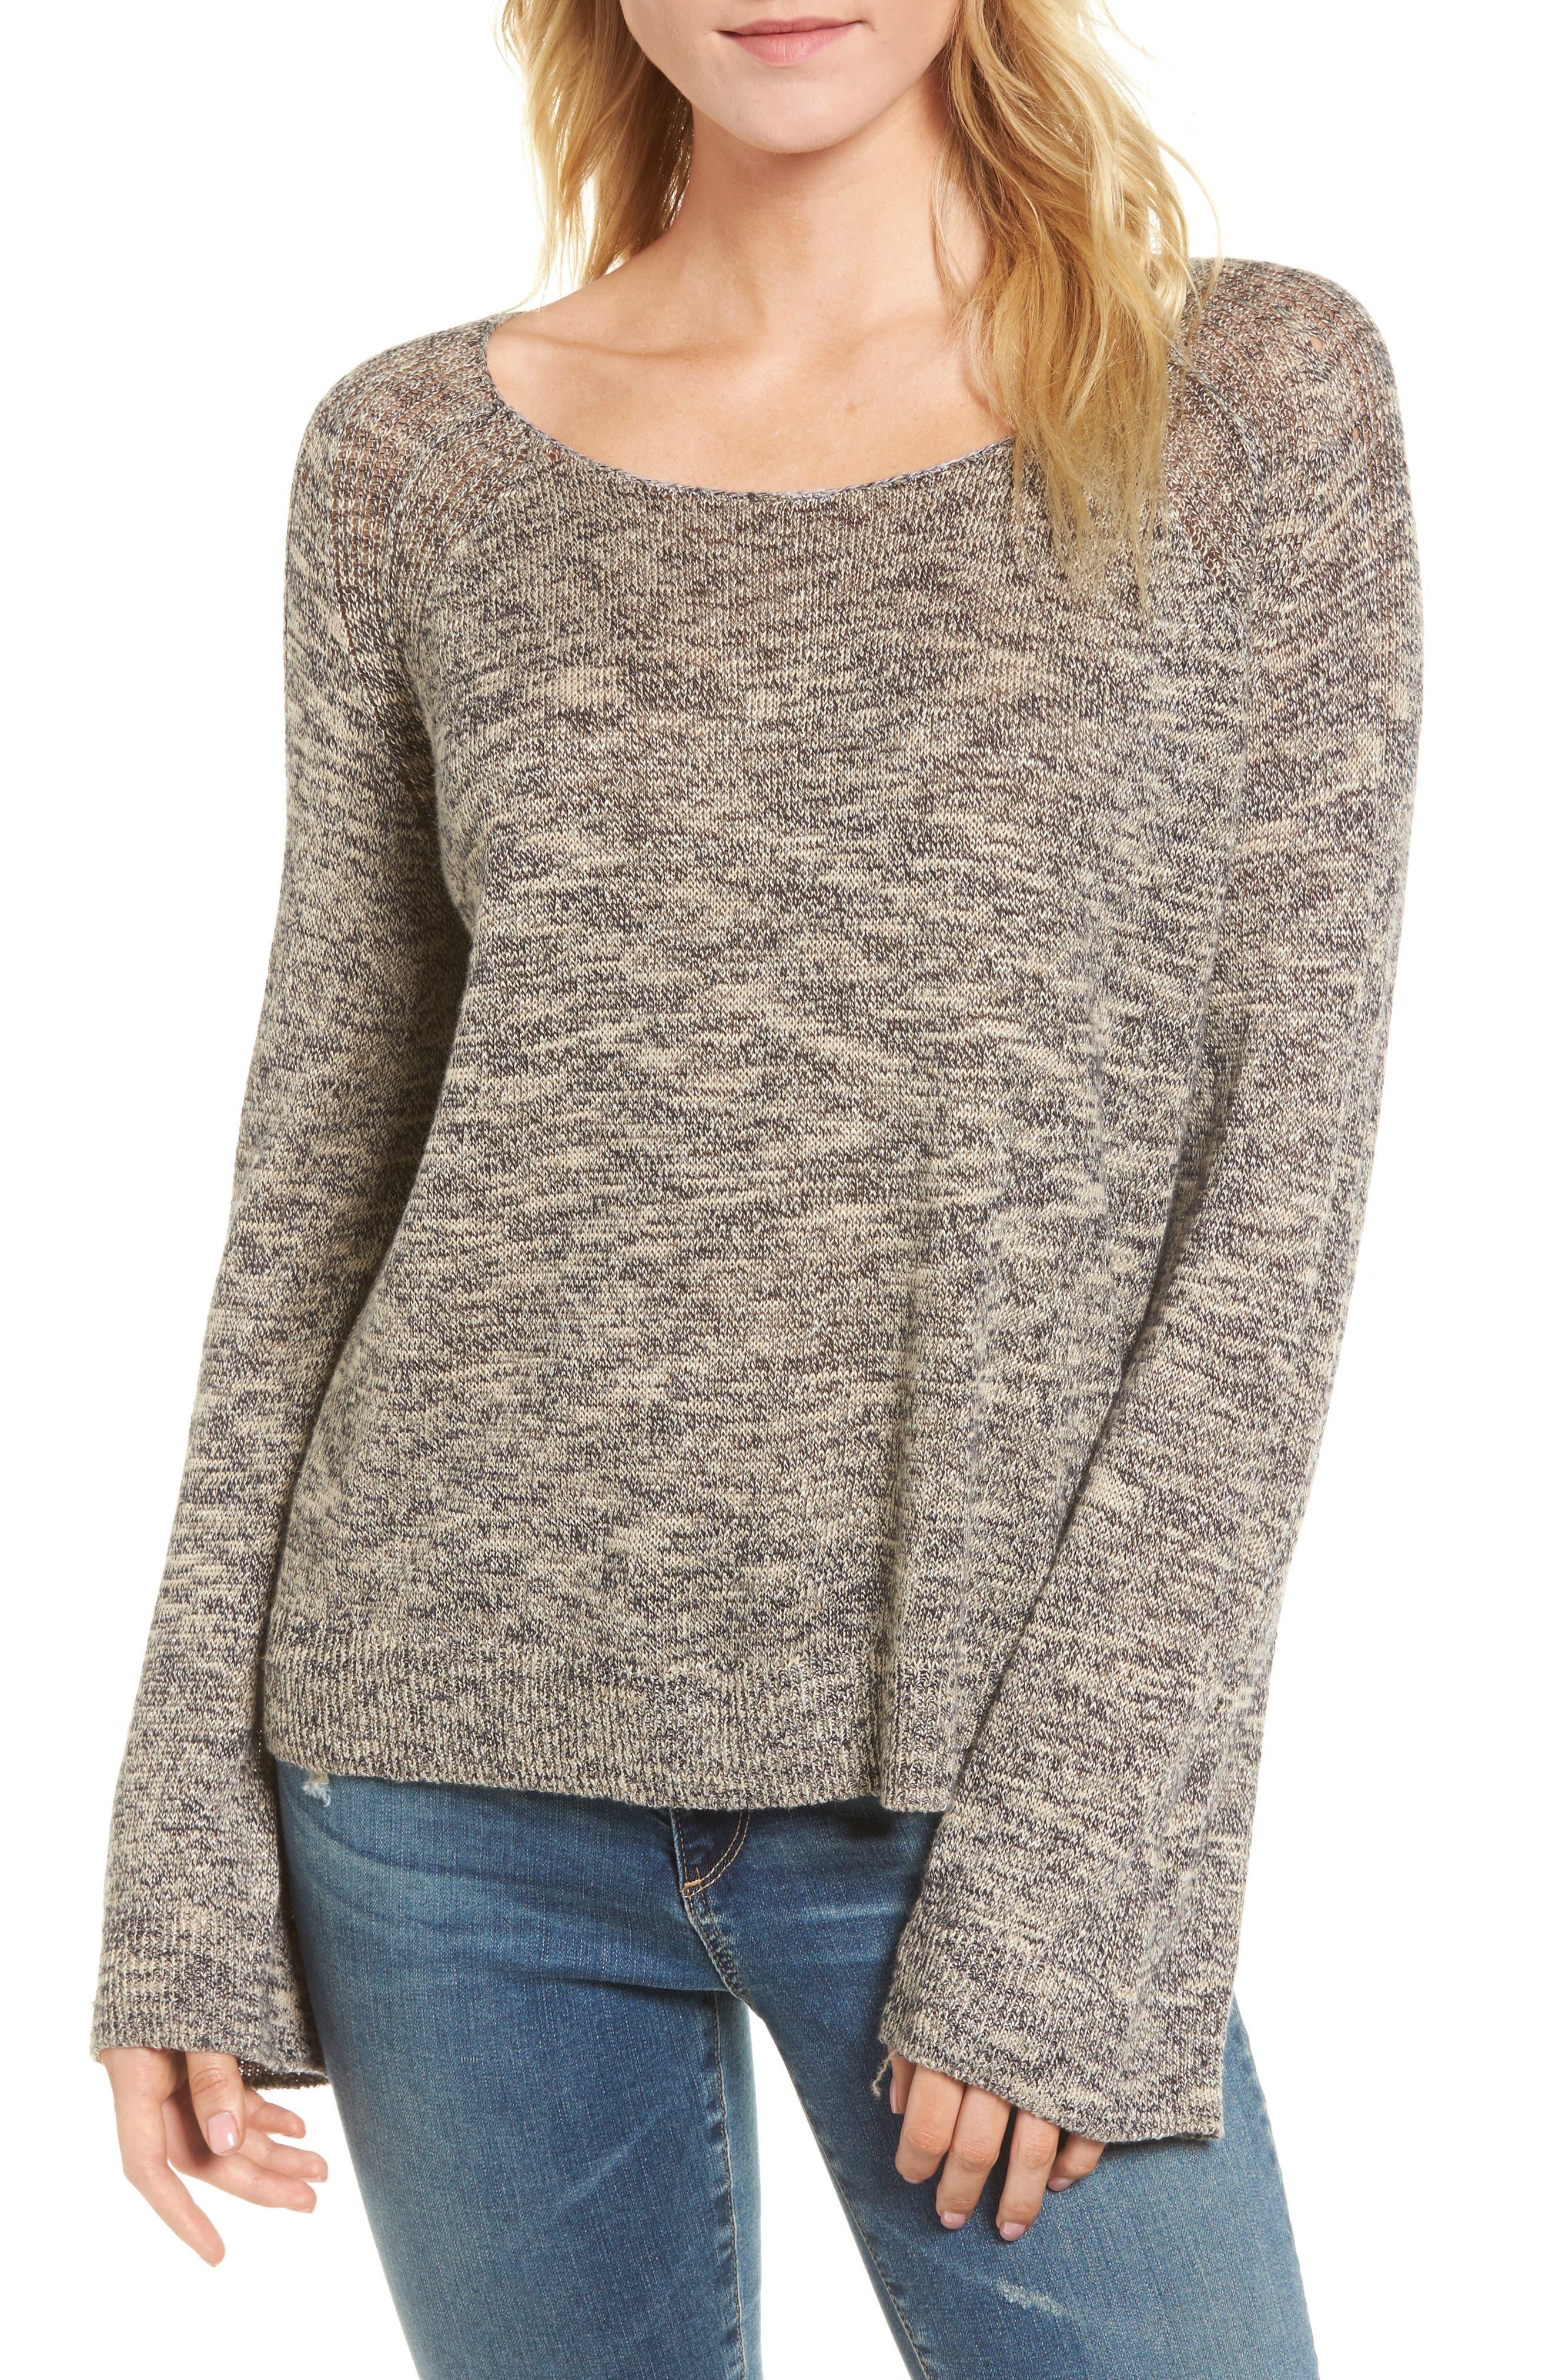 Flora Sweater,                         Main,                         color, Speckled Navy/ Beige